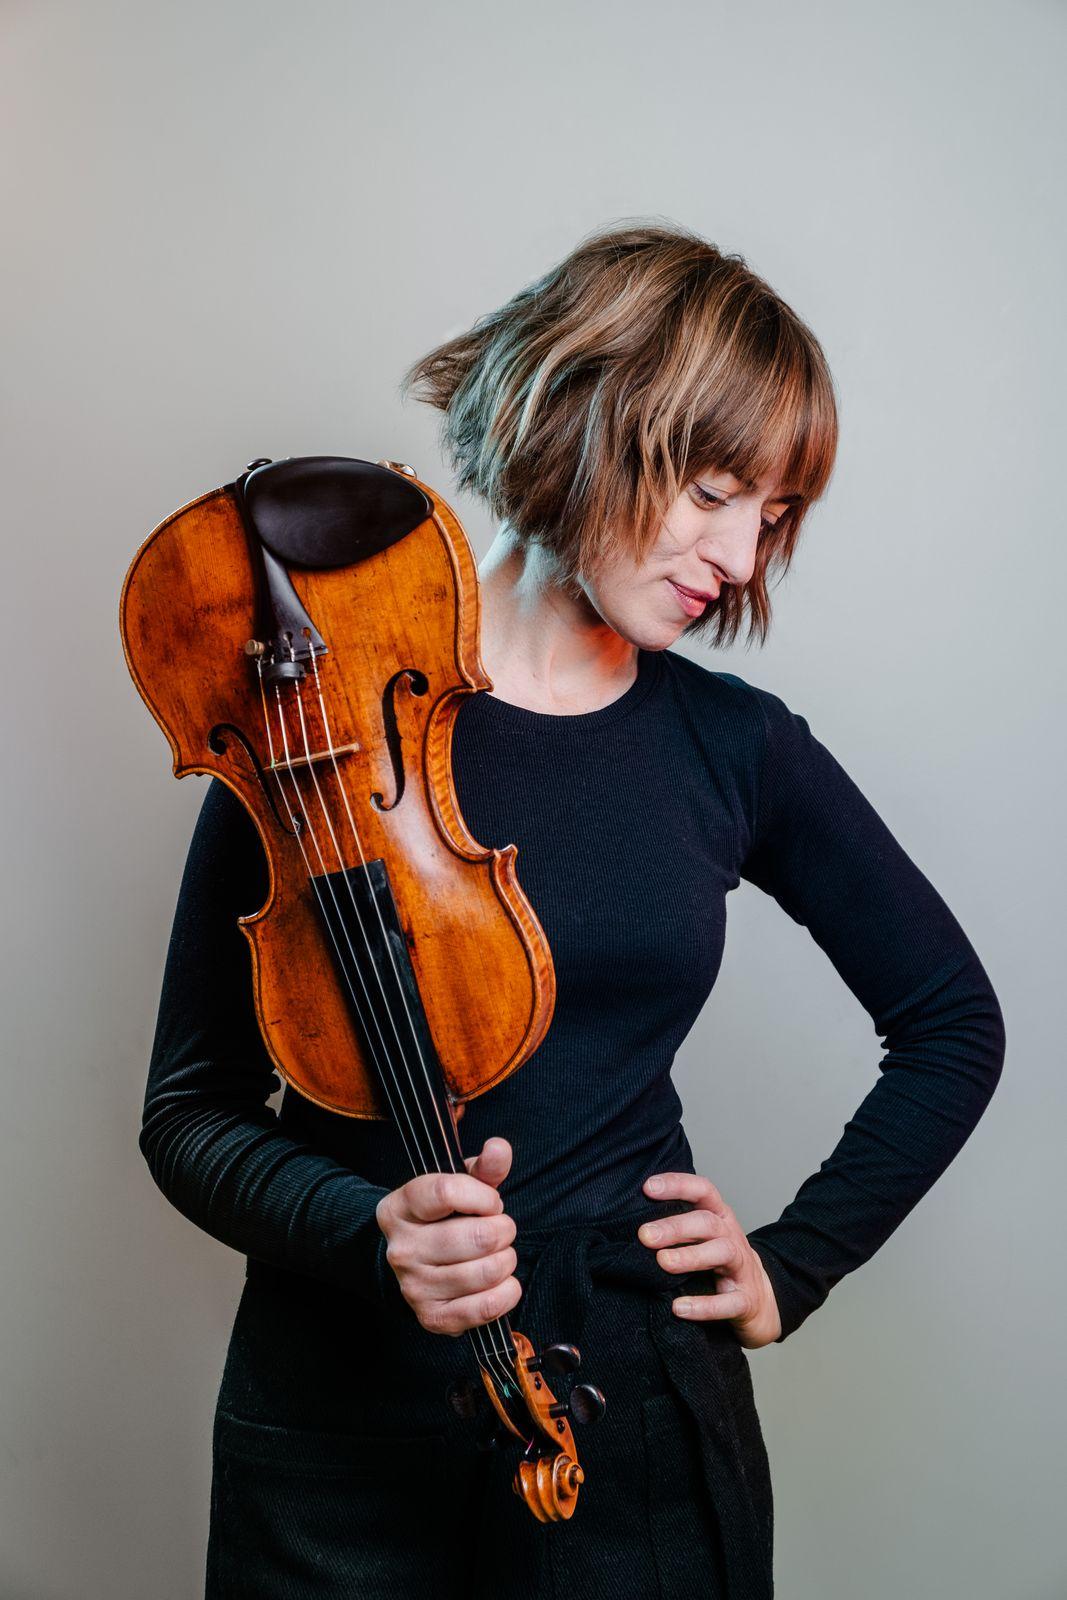 Portsmouth Chamber Music Series: Ensemble Perpetuo - Portsmouth Chamber Music Series 2021-22